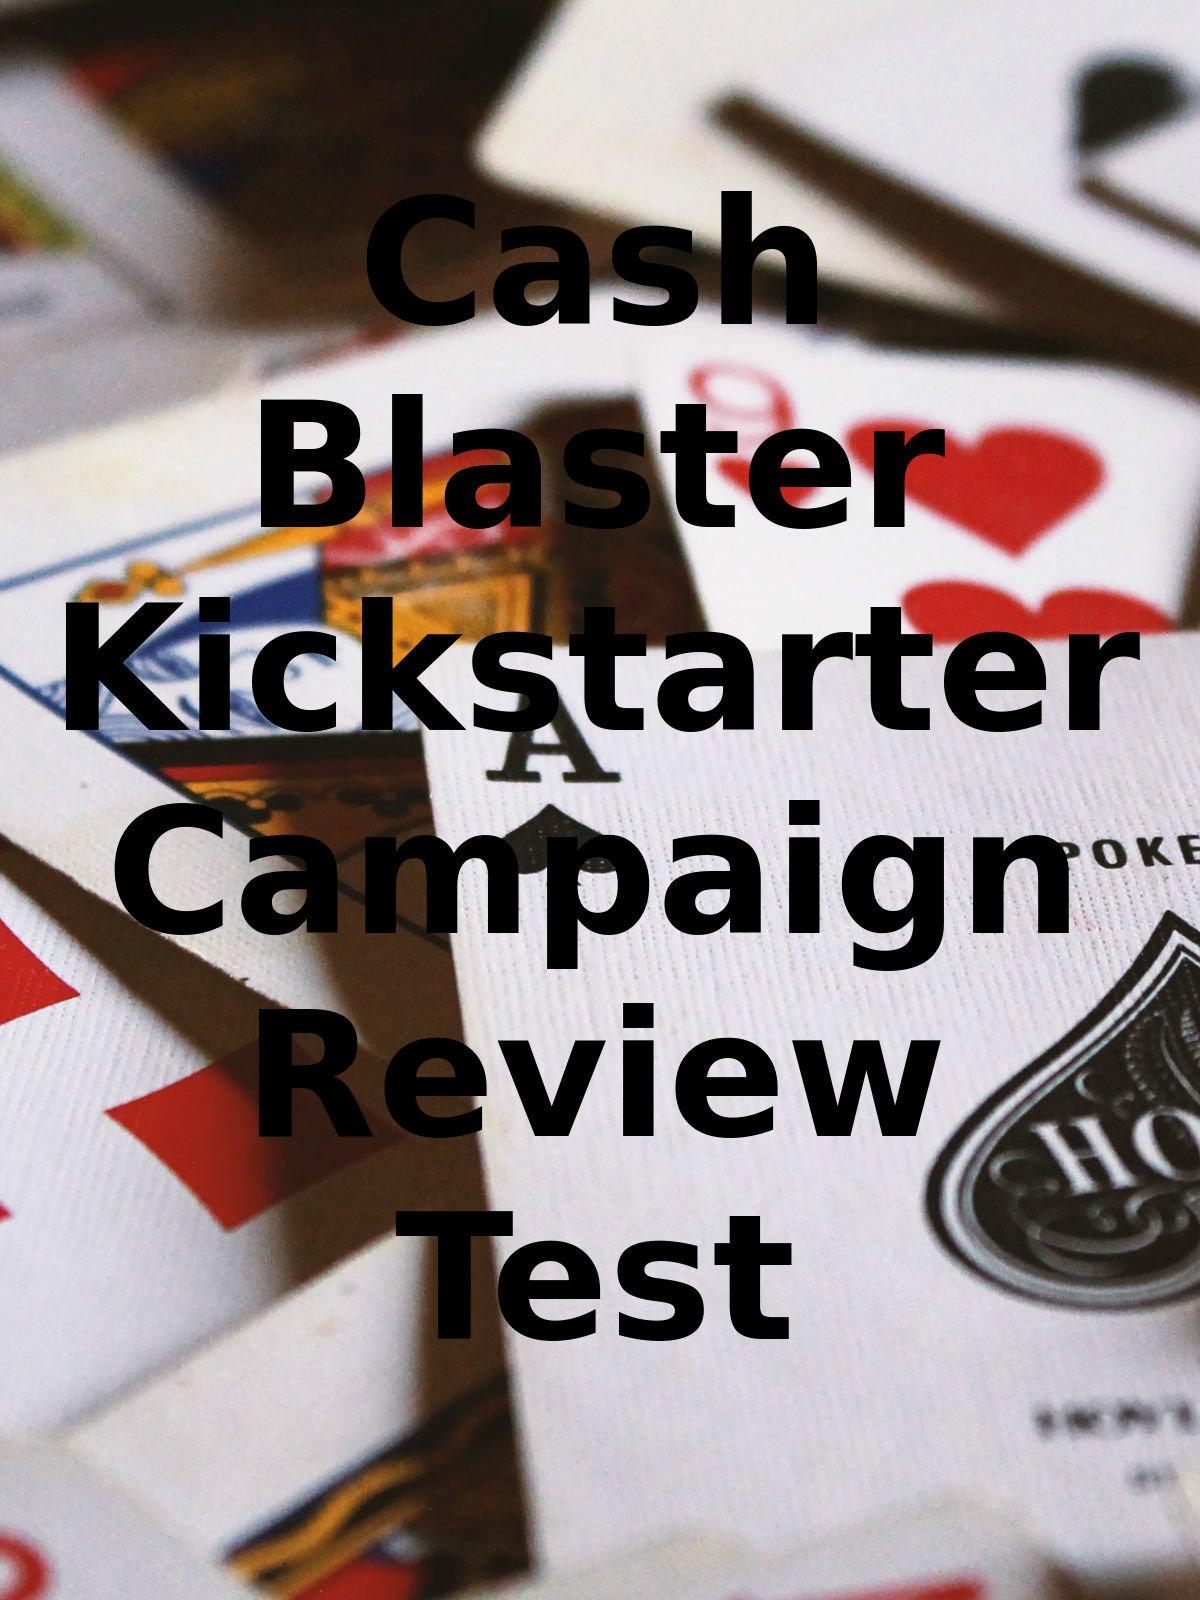 Review: Cash Blaster Kickstarter Campaign Review Test